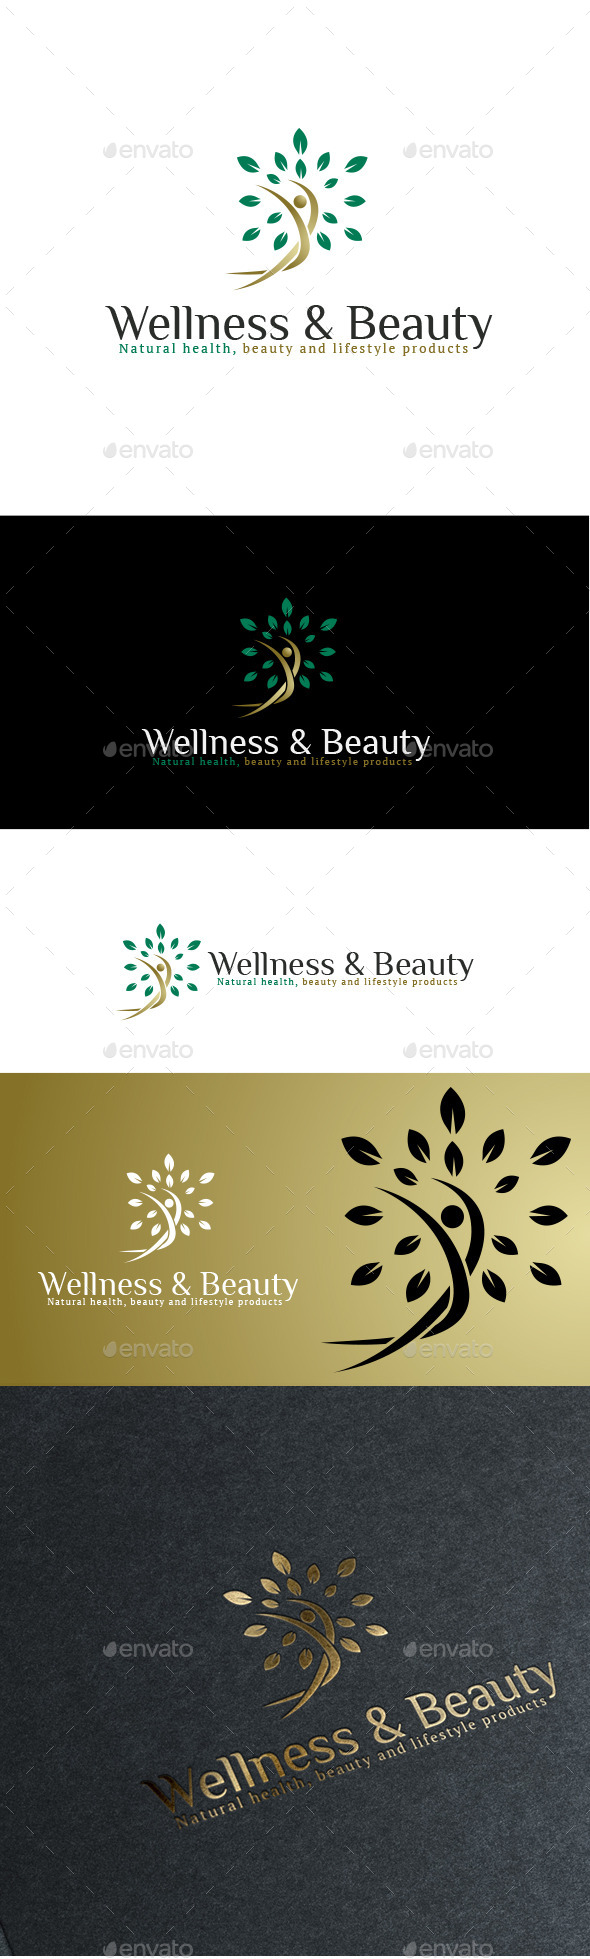 GraphicRiver Naturals Wellness & Beauty Logo 11020755